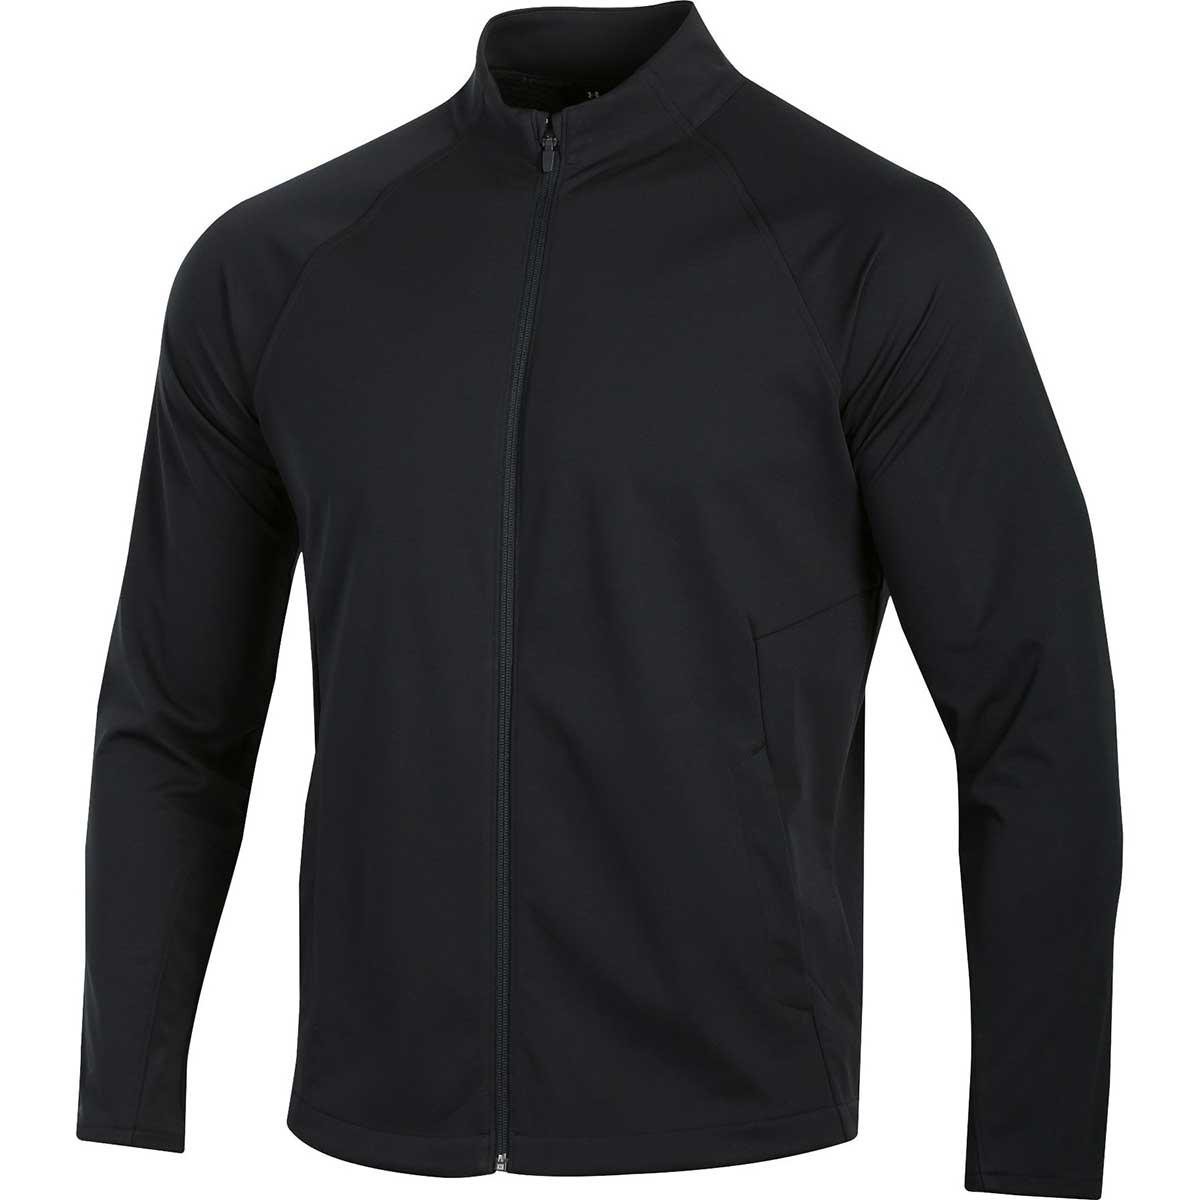 Under Armour Men's Storm Softshell Full Zip Jacket